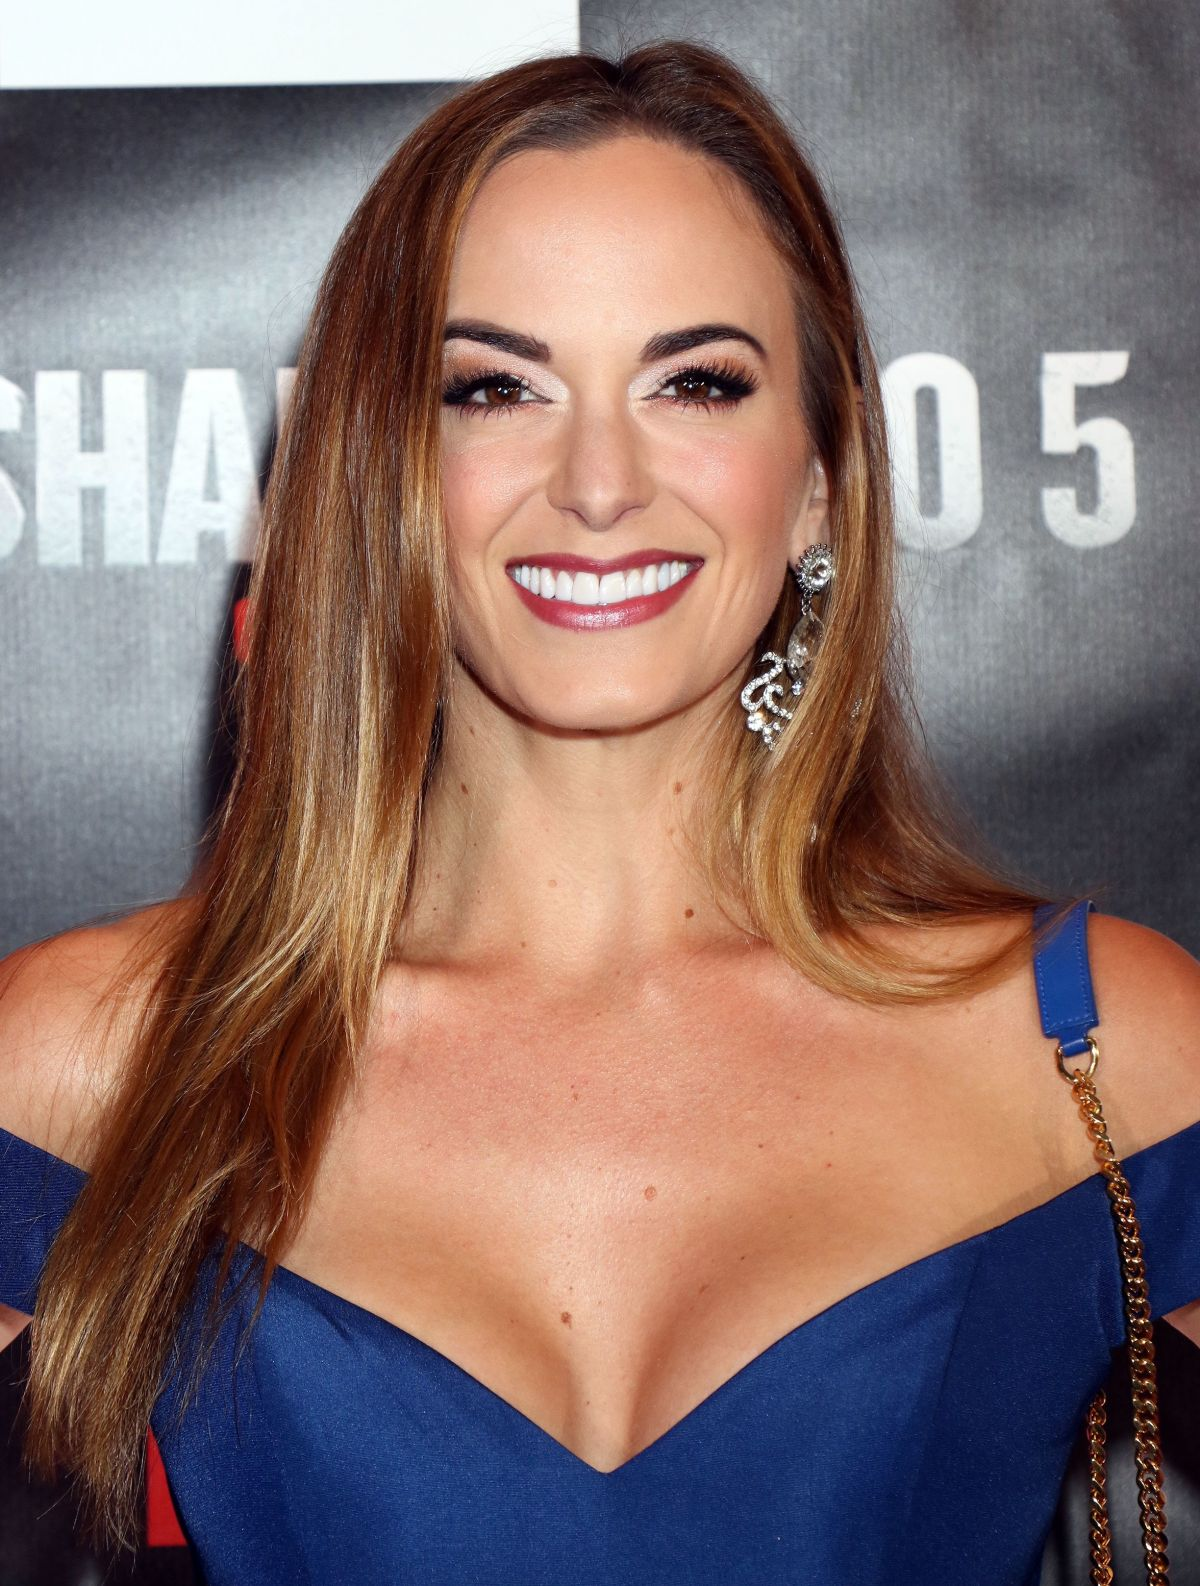 JENA SIMS at Sharknado 5: Global Swarming Premiere in Las